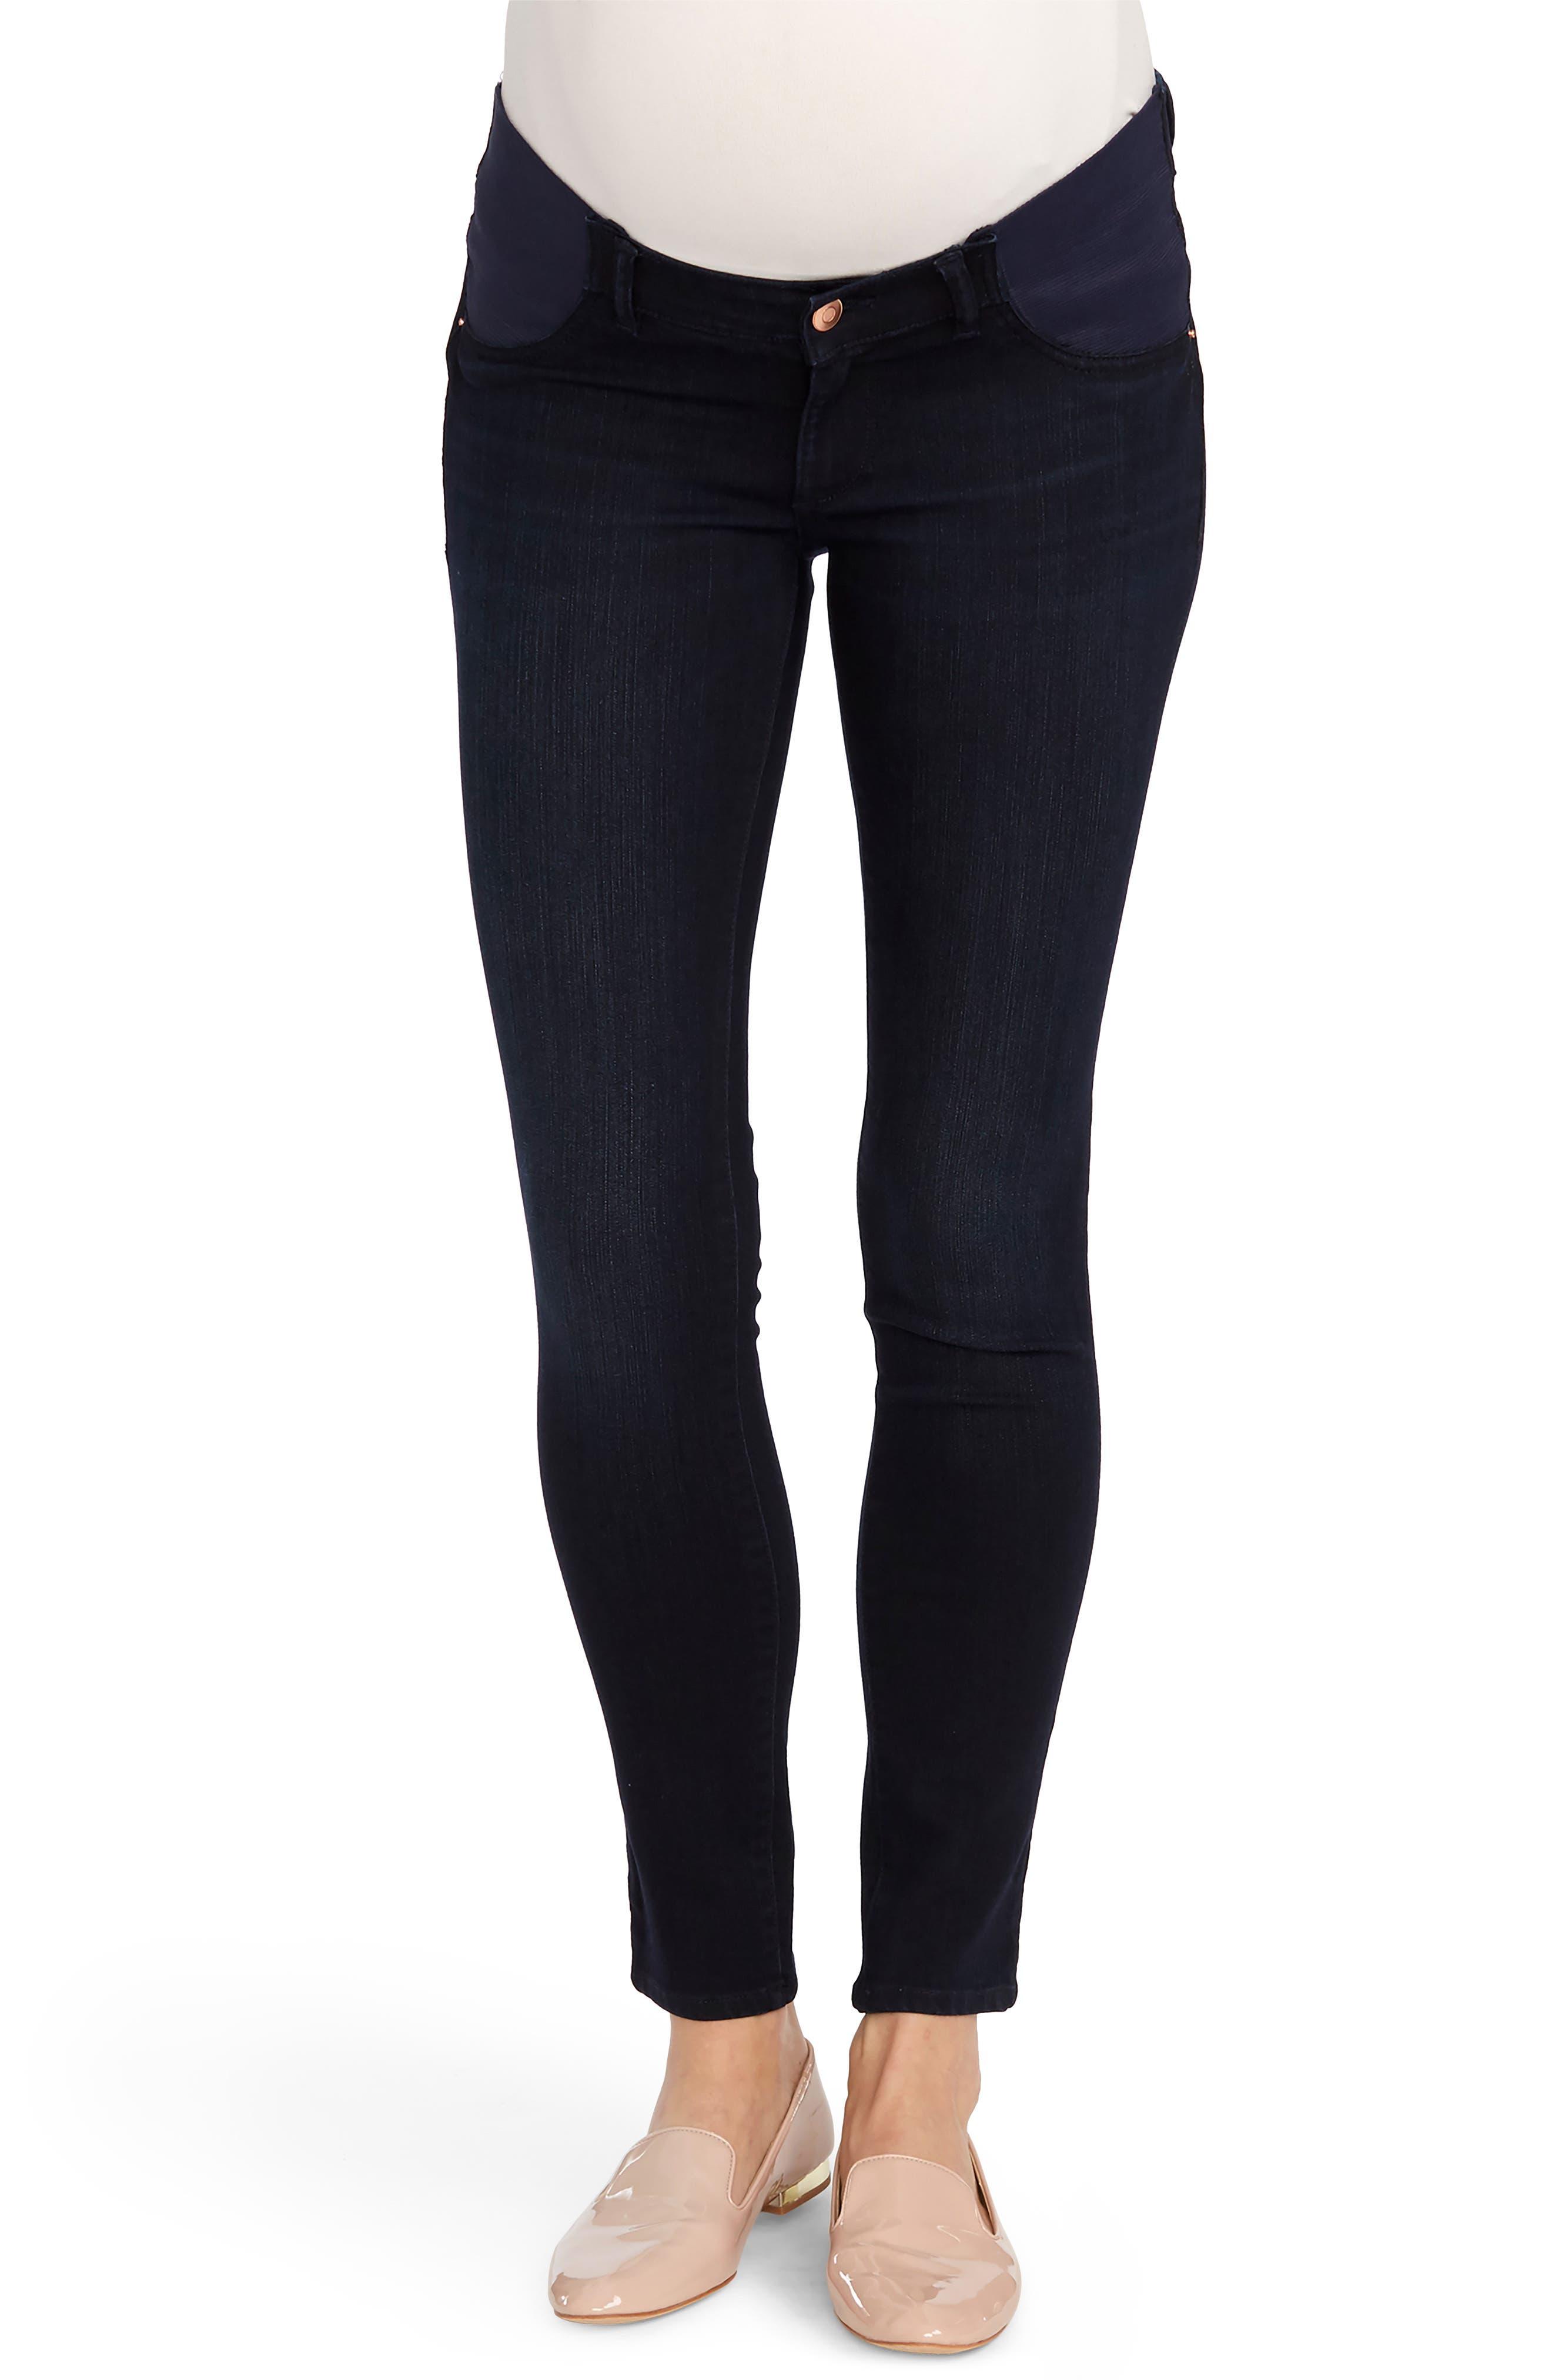 Rosie Pope x dl1961 Skinny Maternity Jeans